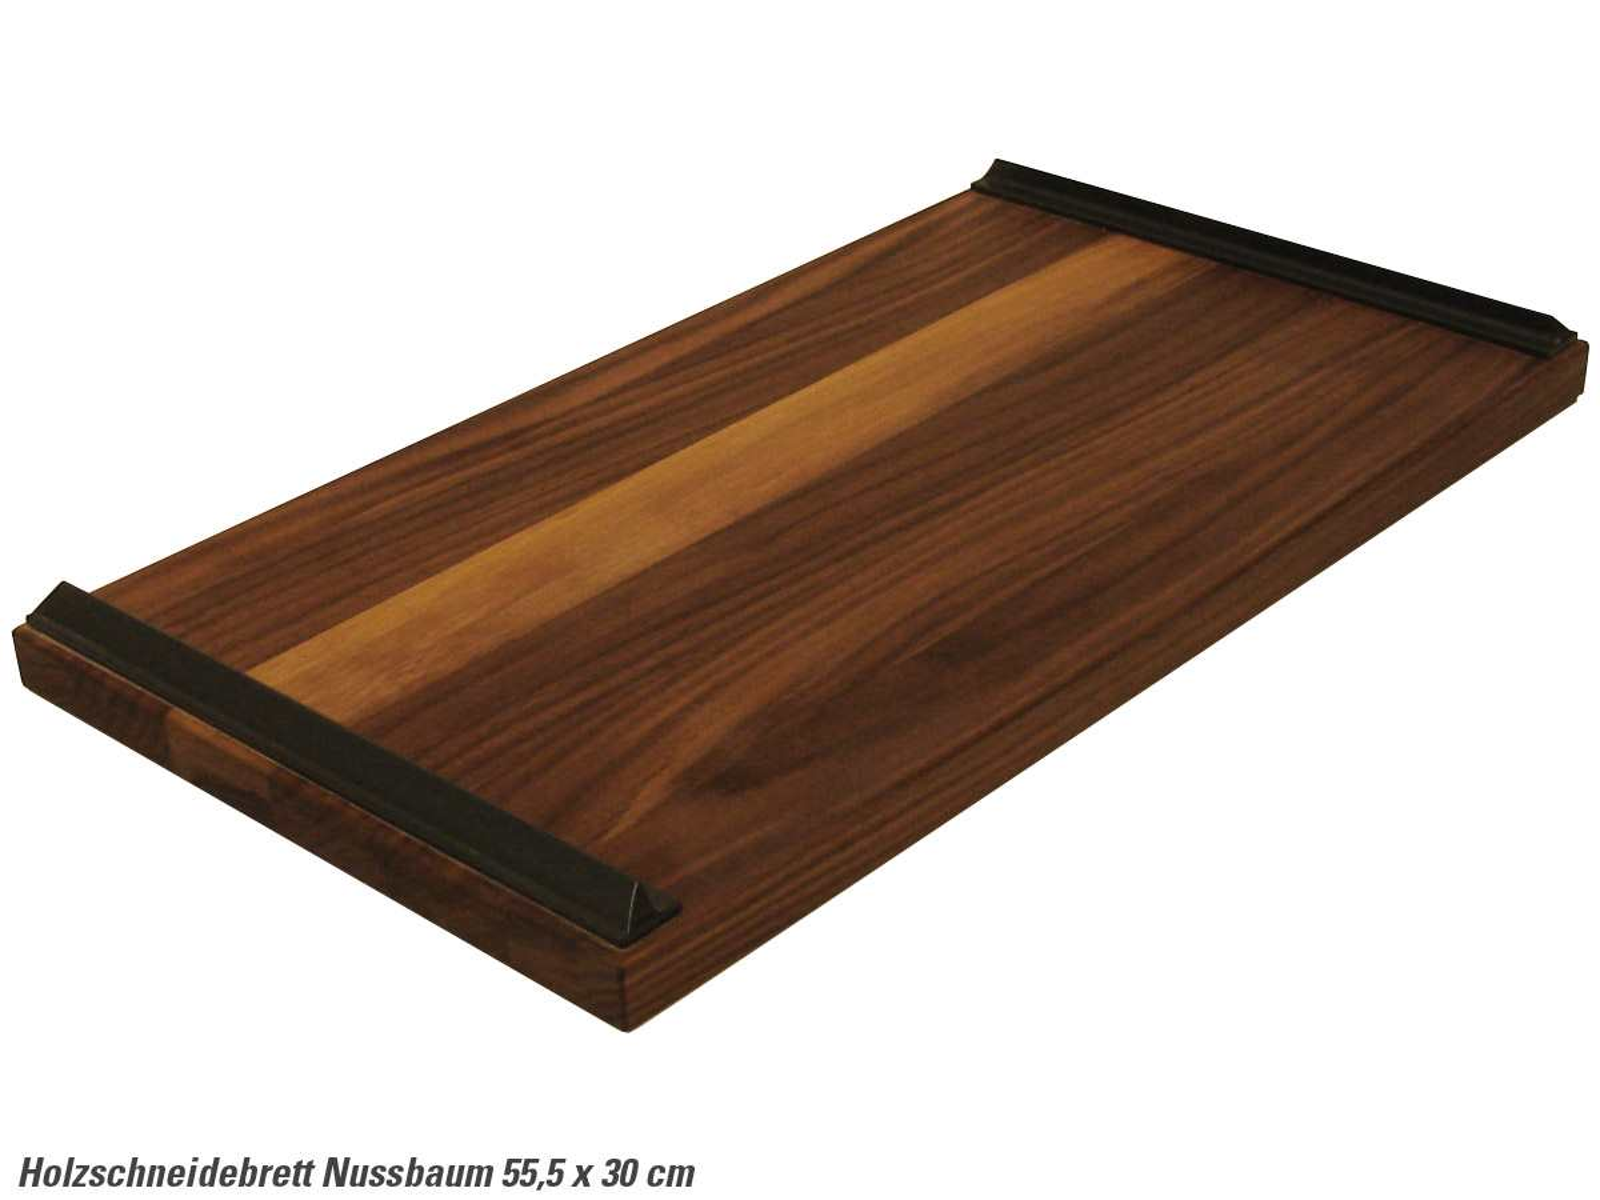 nussbaum schneidebrett holzbrett holz auflagebrett ebay. Black Bedroom Furniture Sets. Home Design Ideas